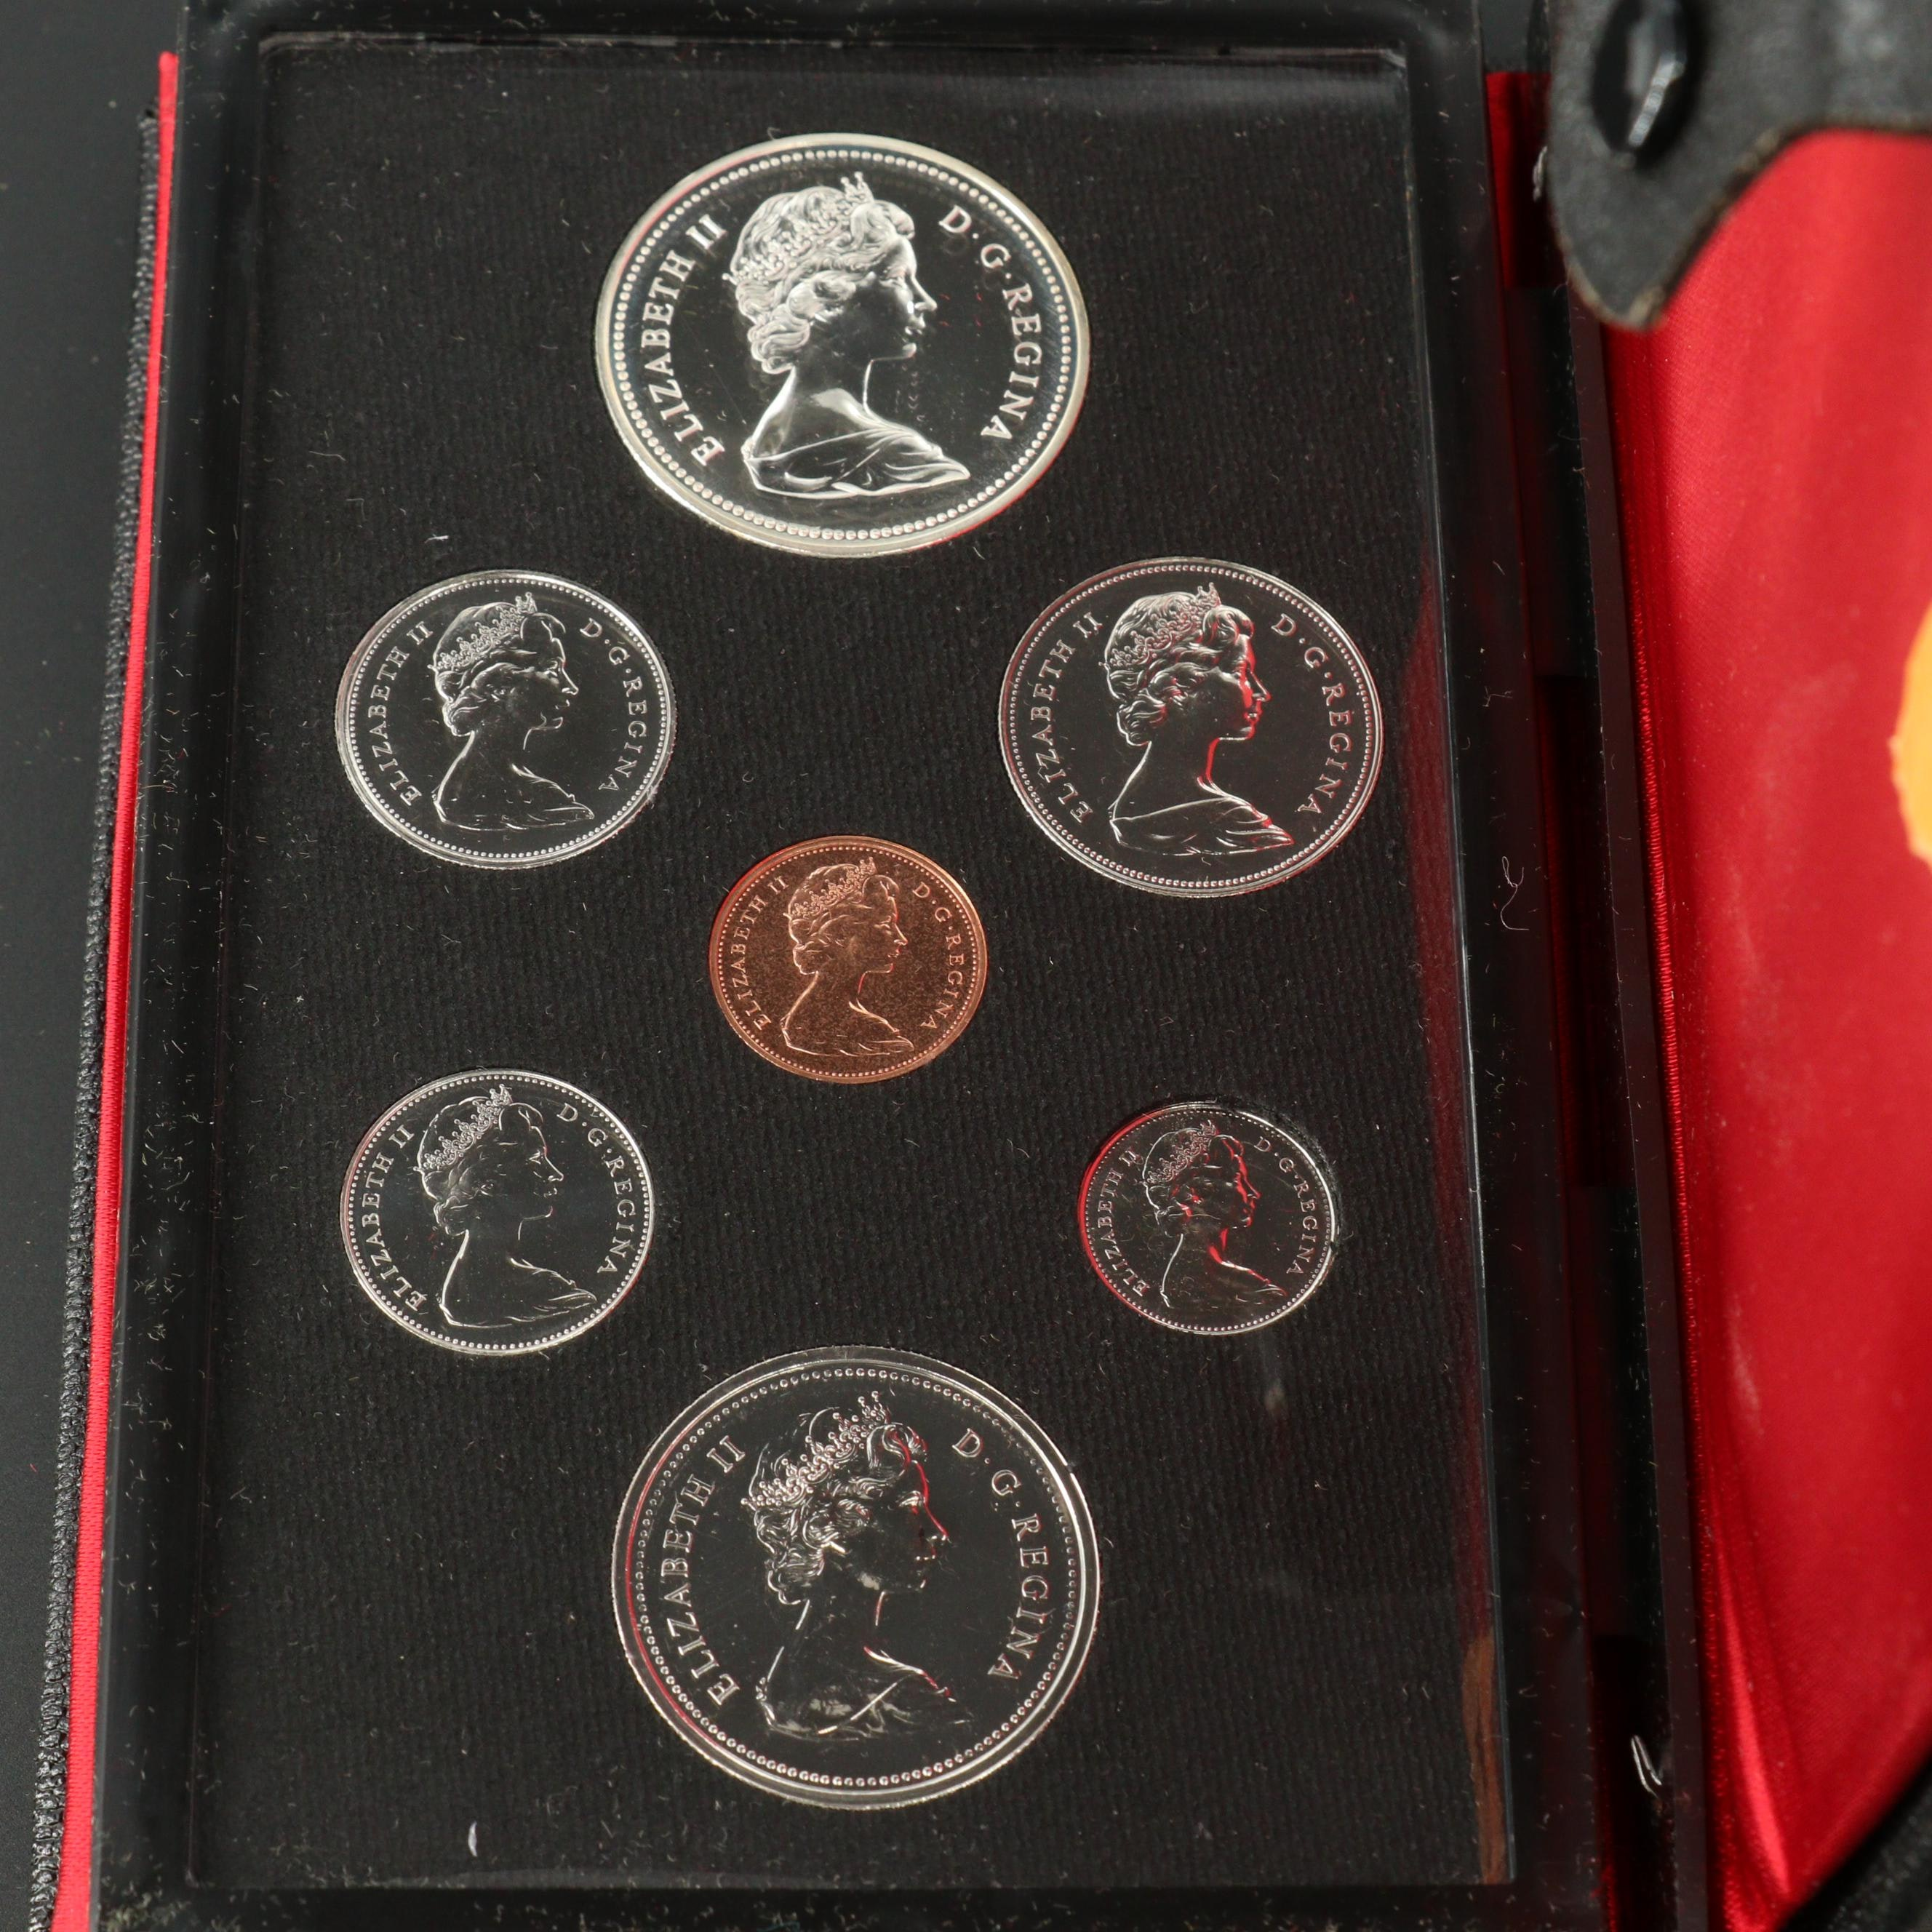 1976 Royal Canadian Mint Proof Set